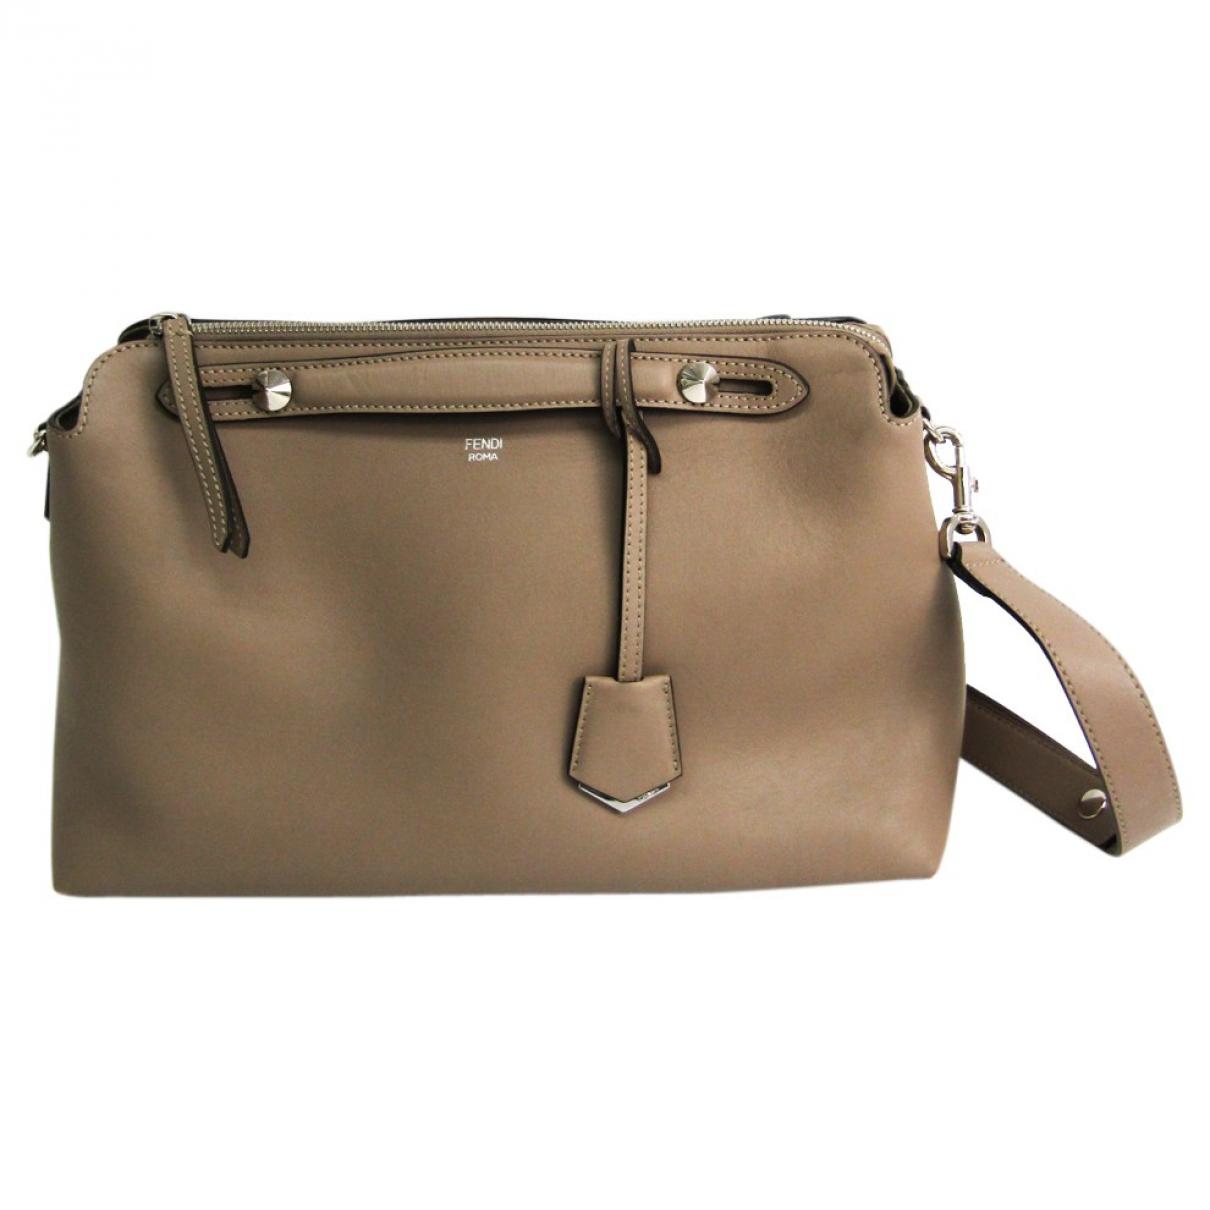 Fendi By The Way  Handtasche in  Beige Leder